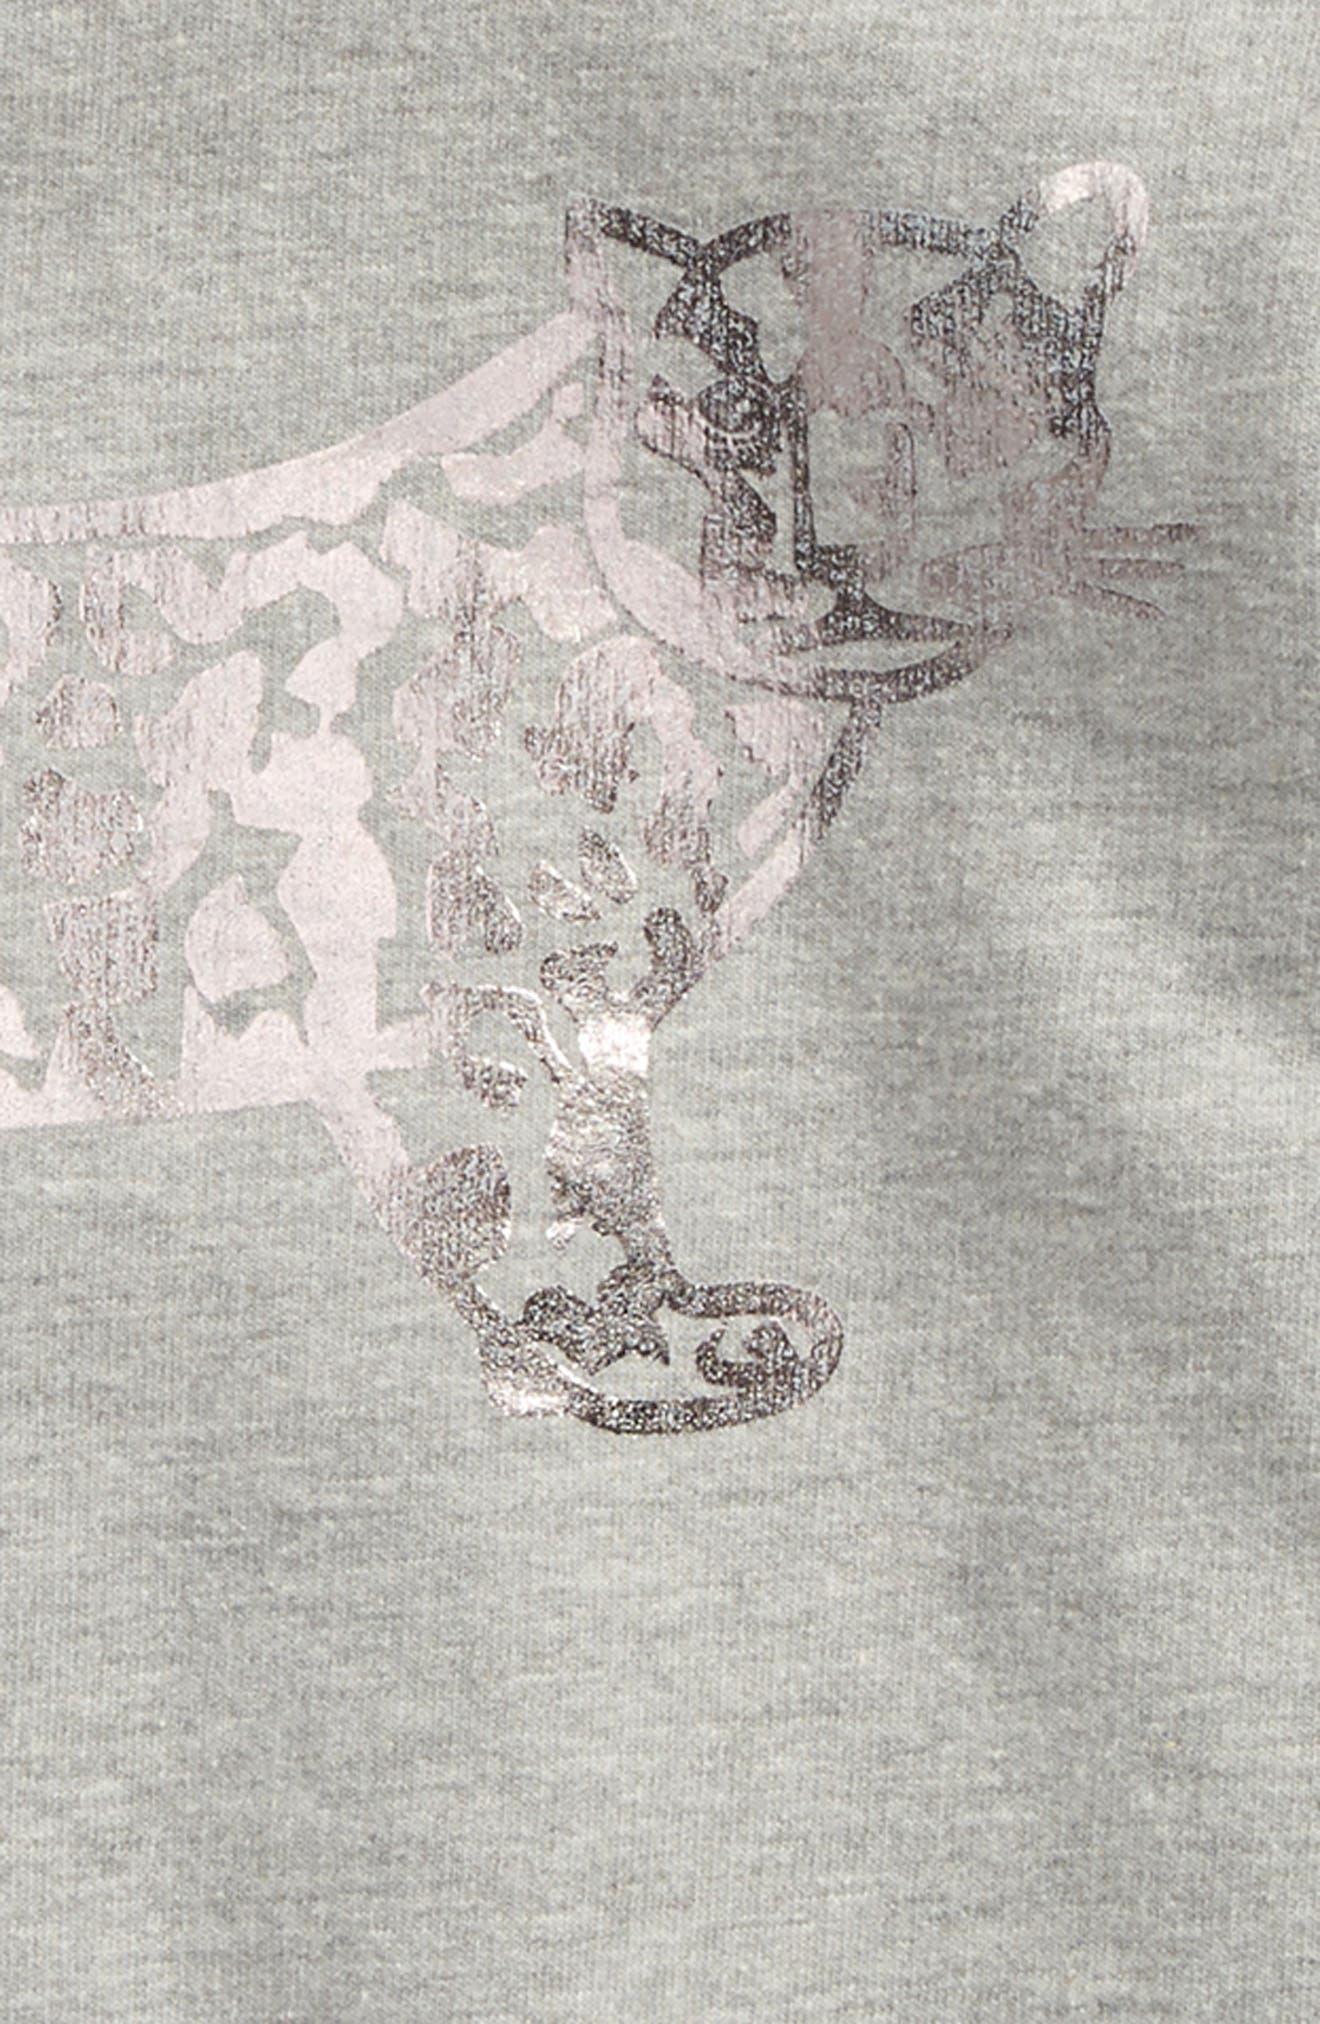 Luna Hooded Sweatshirt Dress,                             Alternate thumbnail 3, color,                             050